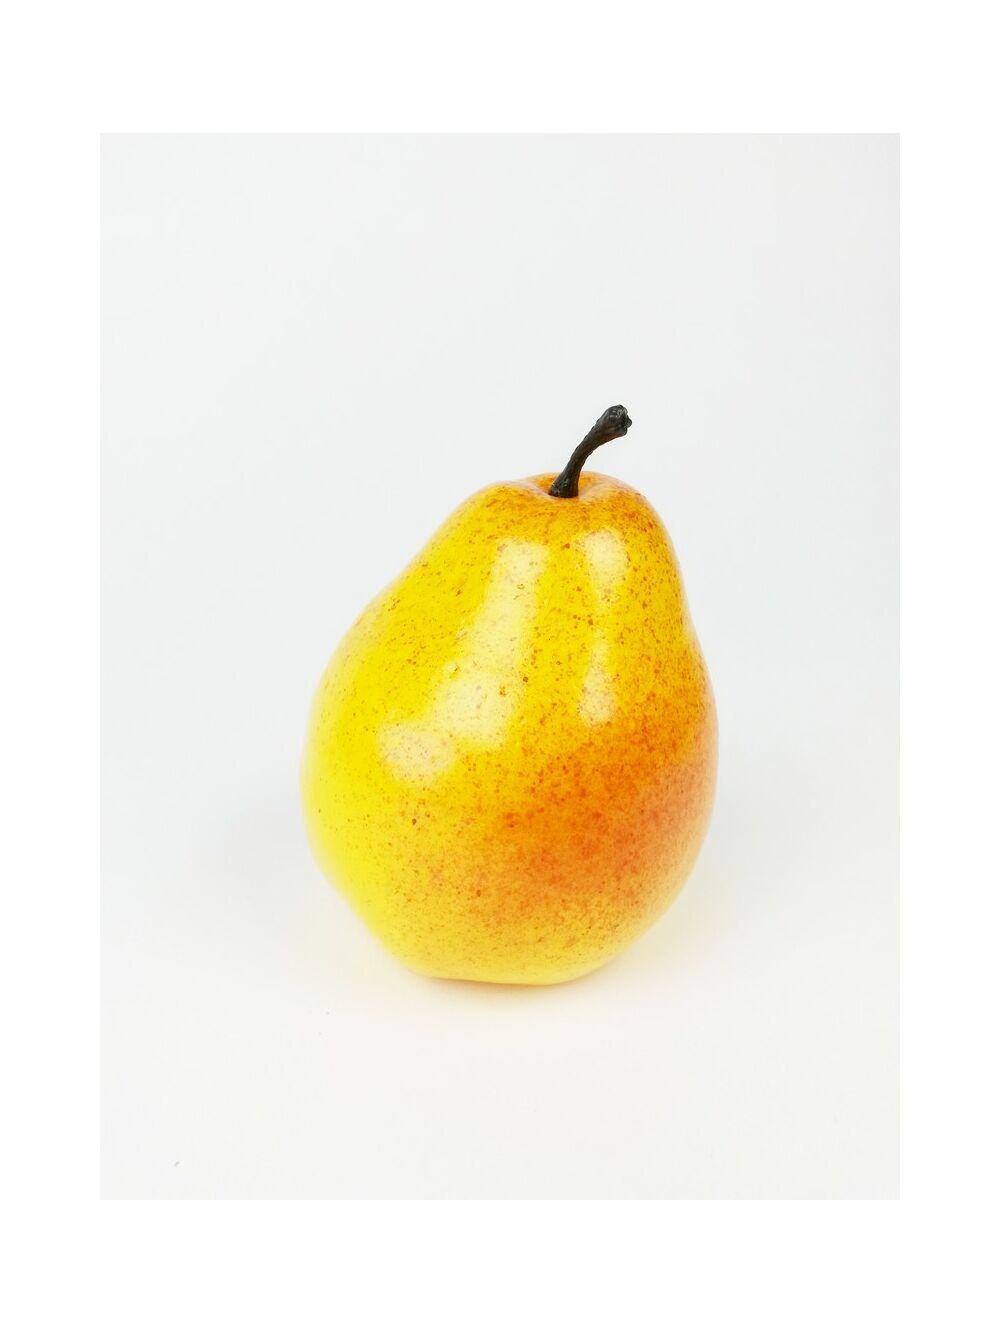 Műkörte nagy darabos - Sárga